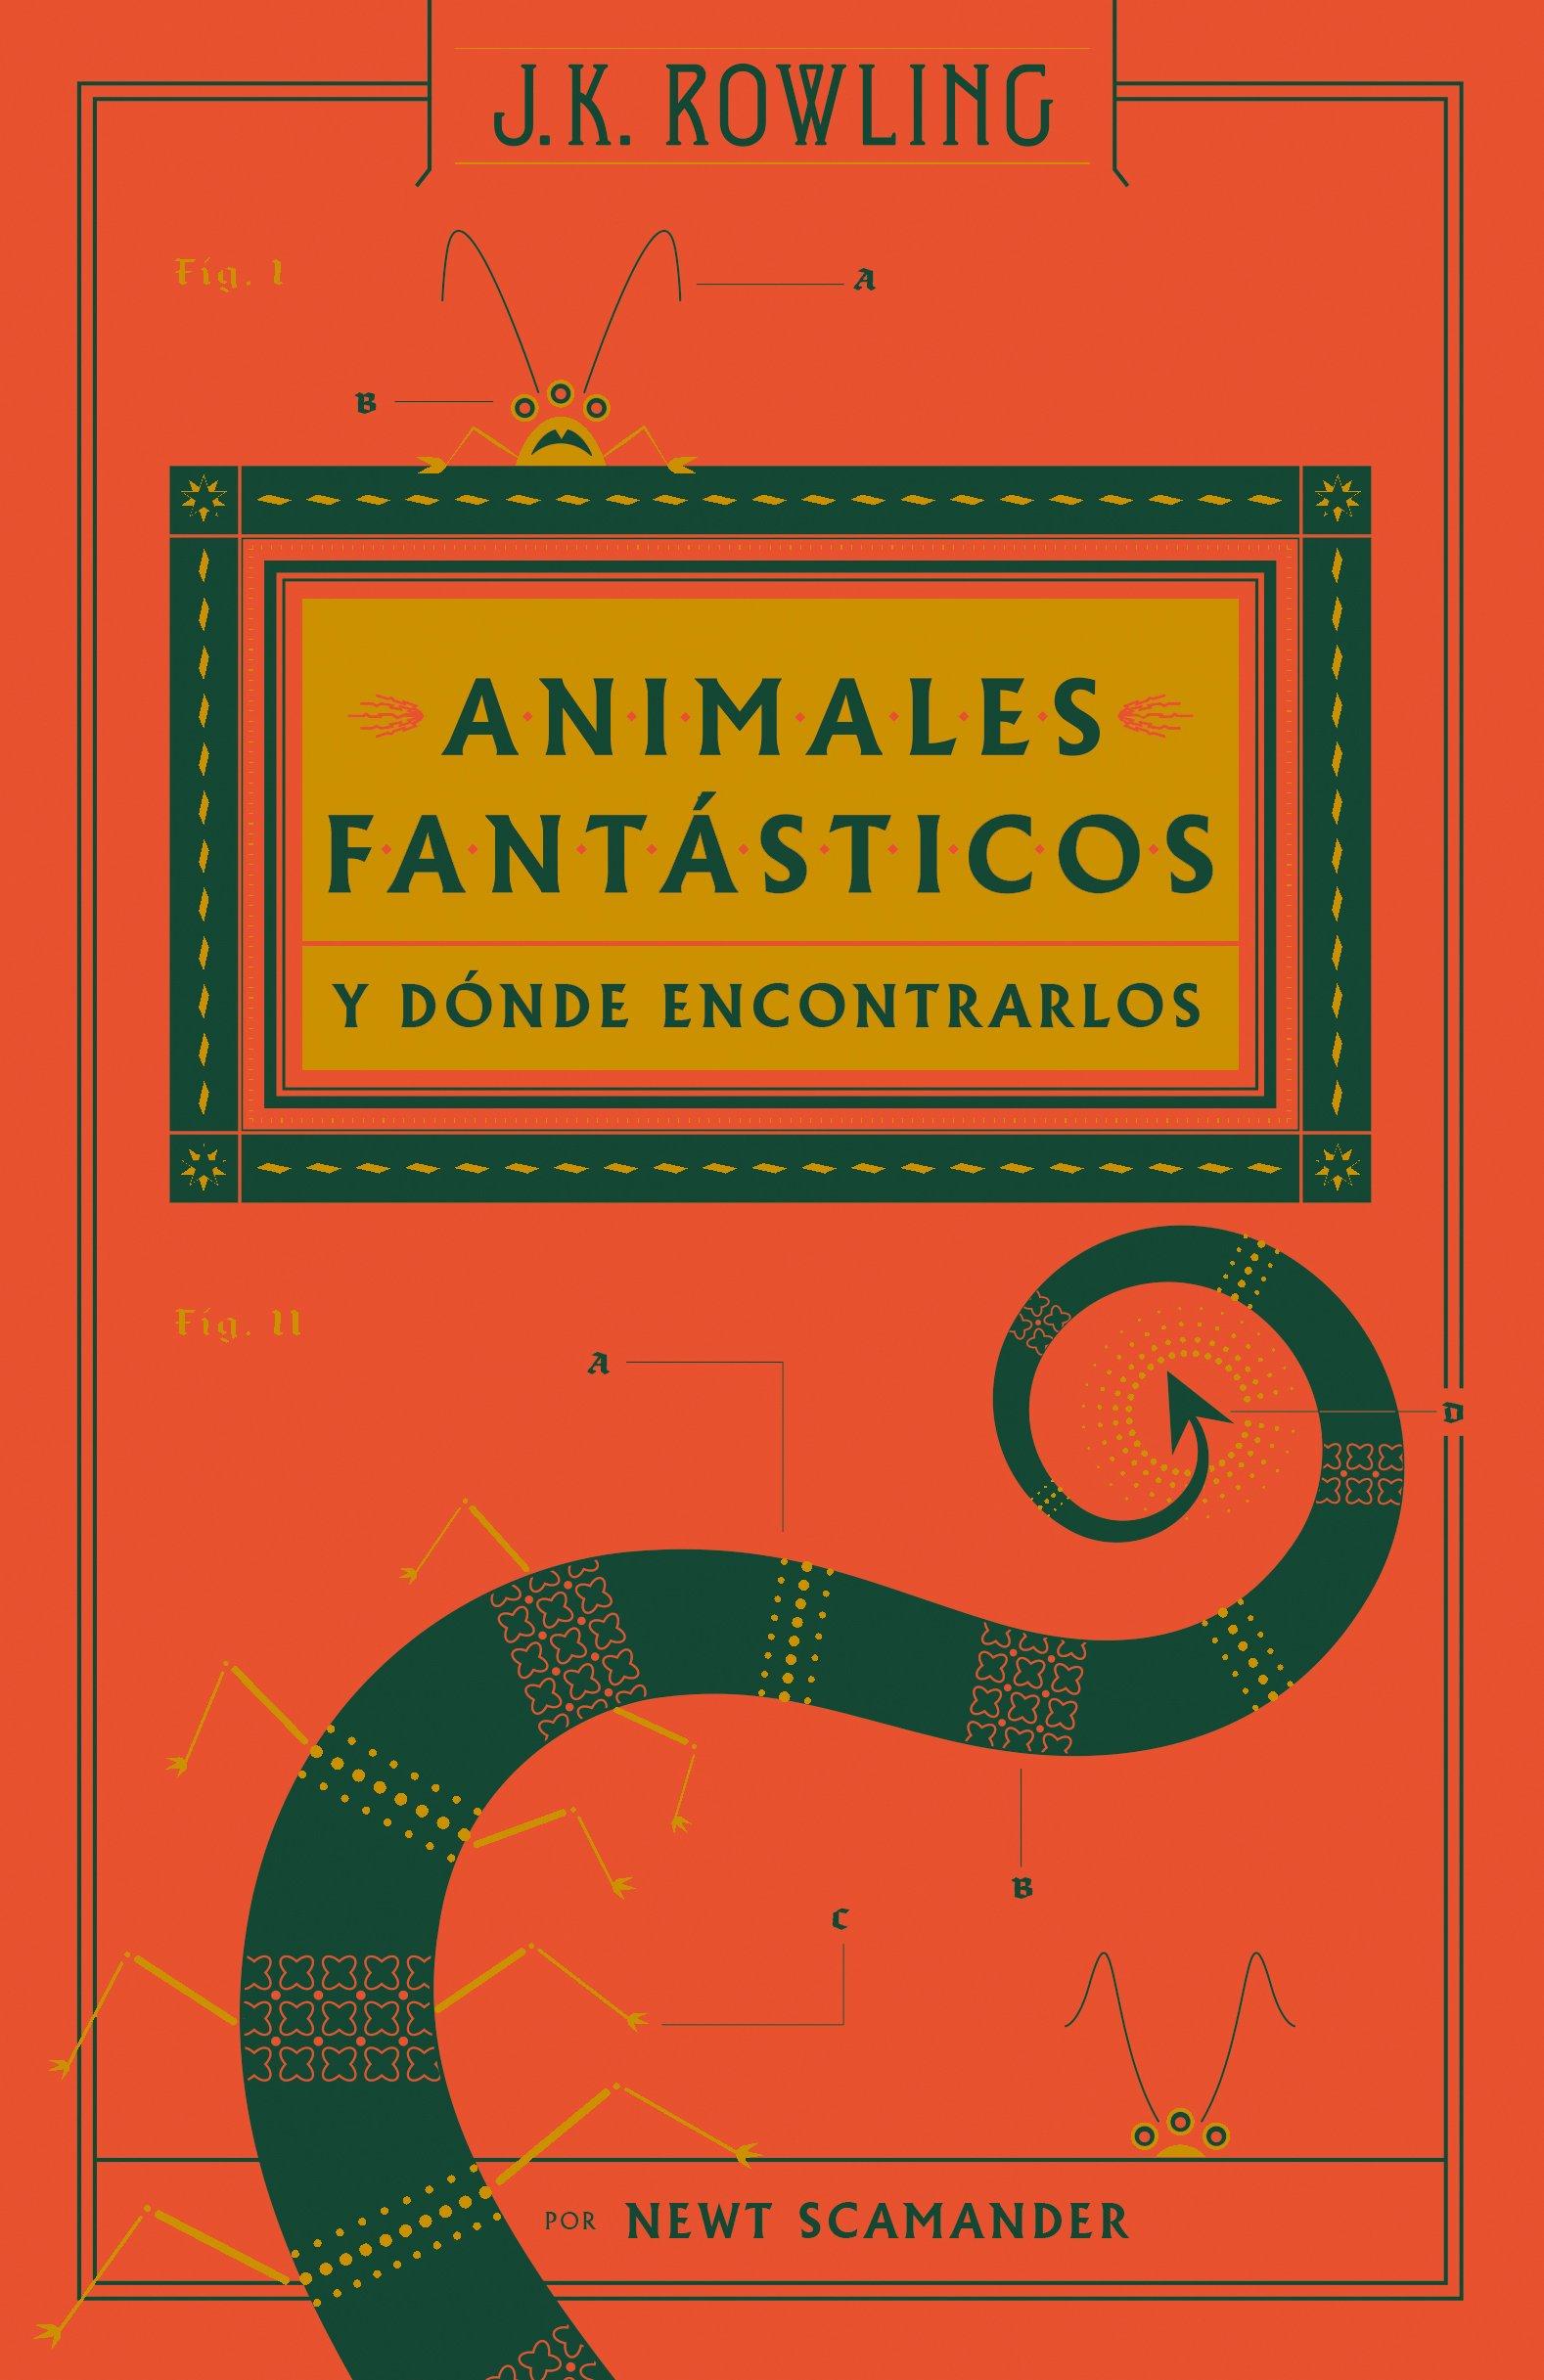 ANIMALES FANTÁSTICOSY DONDE ENCONTARLOS (Nva Ed.) (Juvenil) Tapa dura – 22 mar 2017 J.K. Rowling 8498387949 Animals Mythical